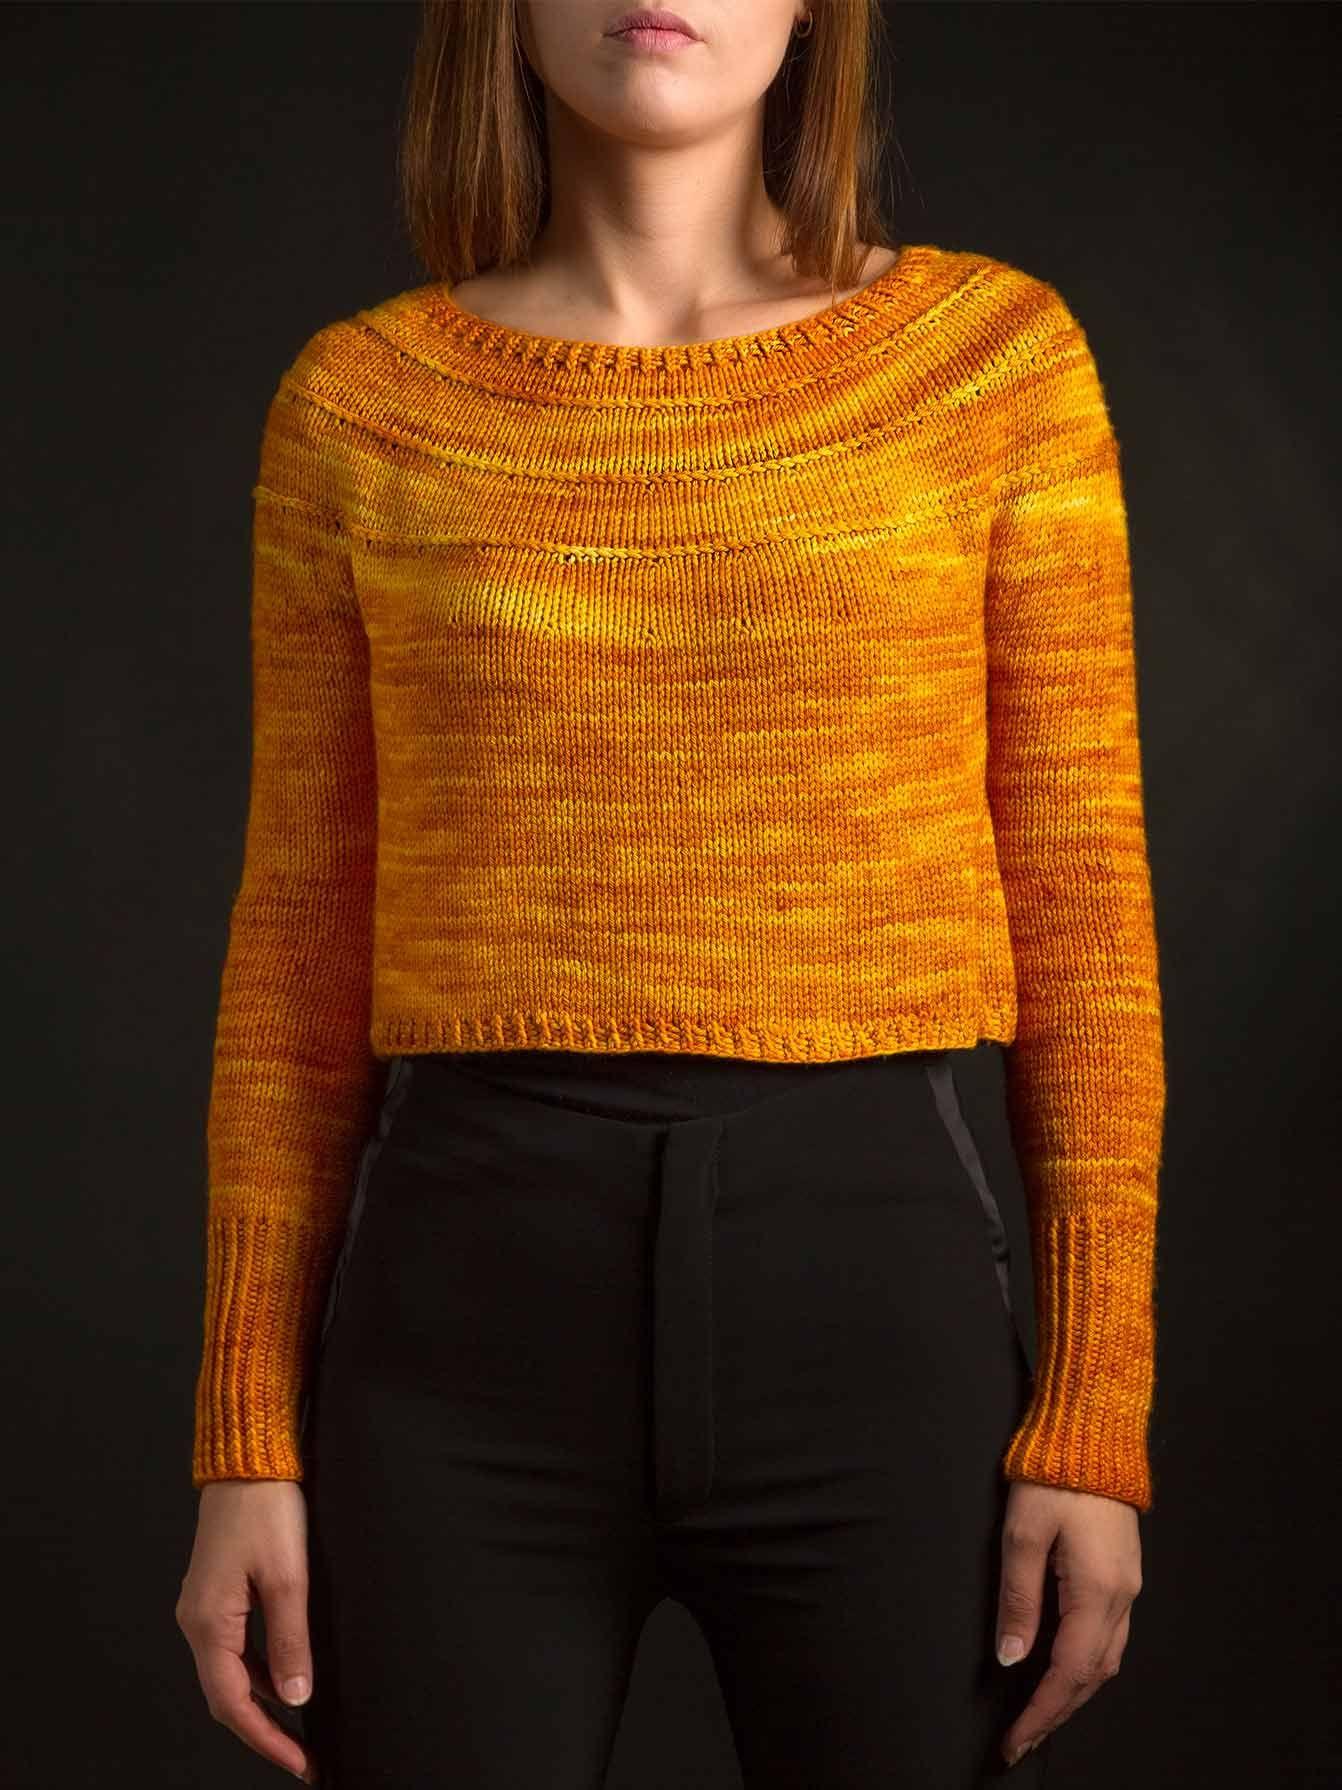 Ubrugte AIRWAVES Sweater by andoliando | malabrigo Rios in Sunset UB-69